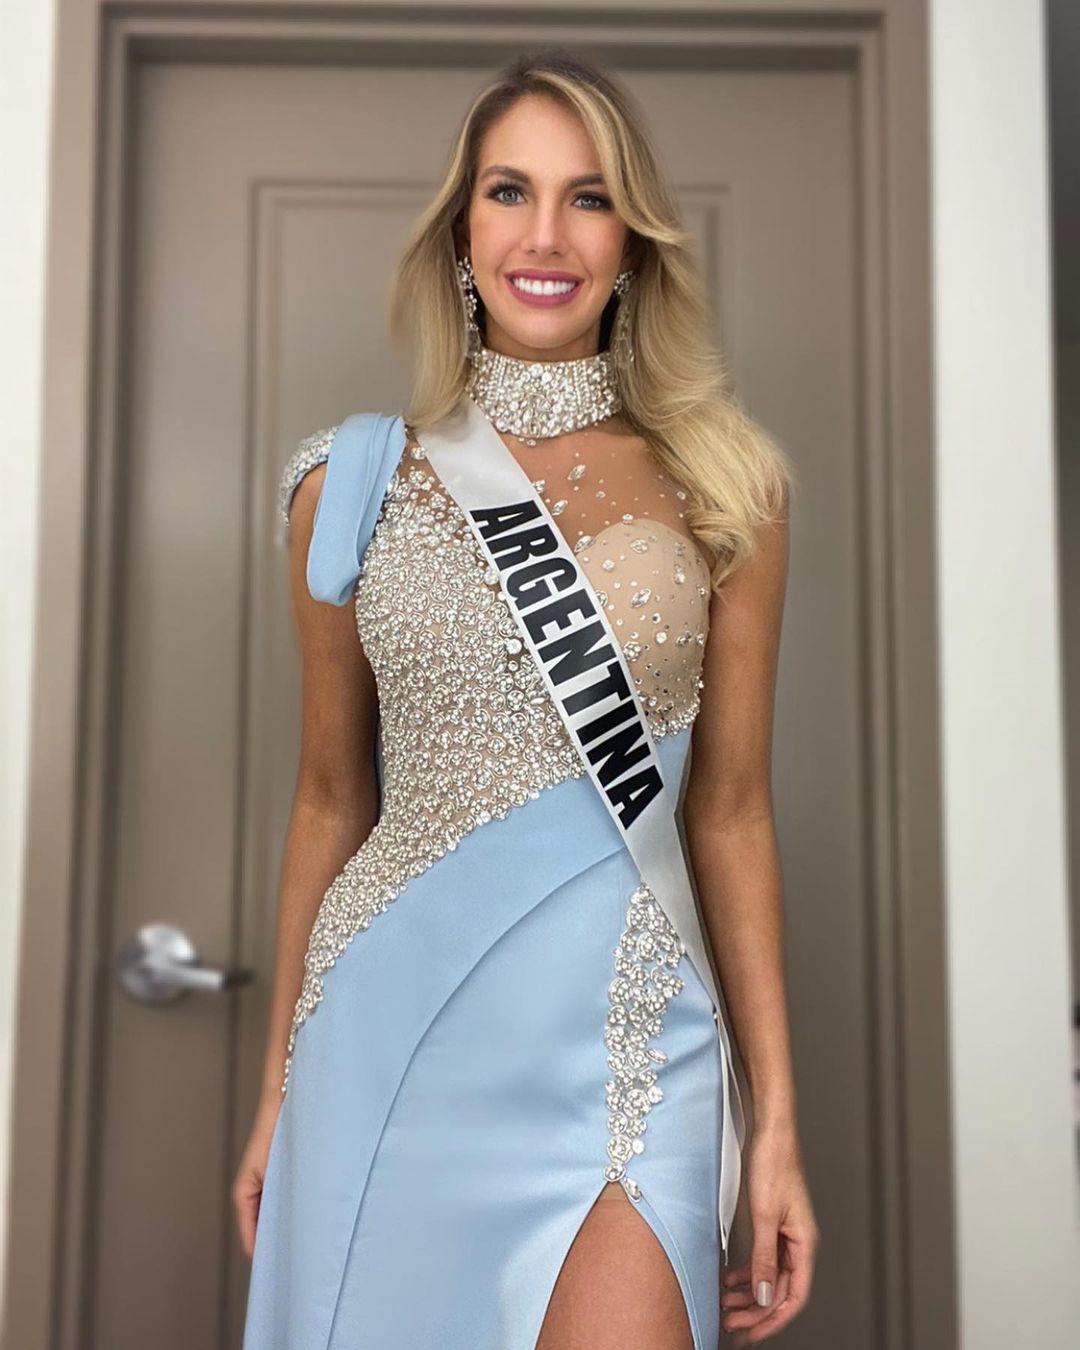 alina akselrad, top 21 de miss universe 2020. - Página 12 20750213